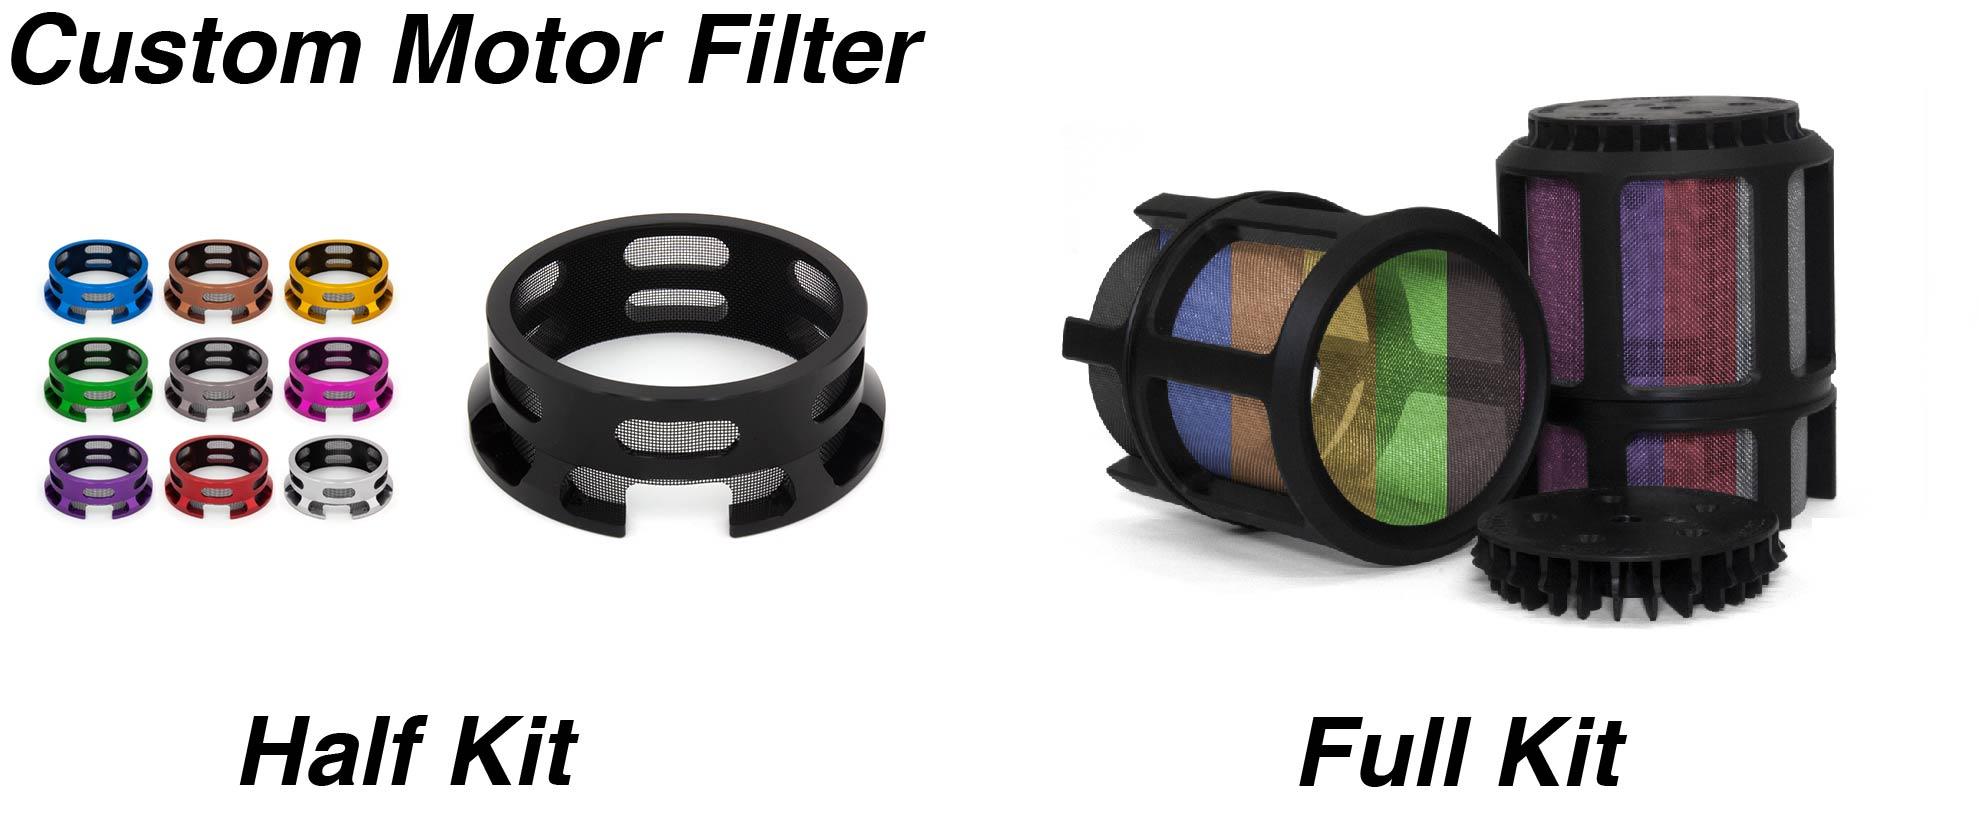 Custom Motor Filters - HALF or FULL Cage